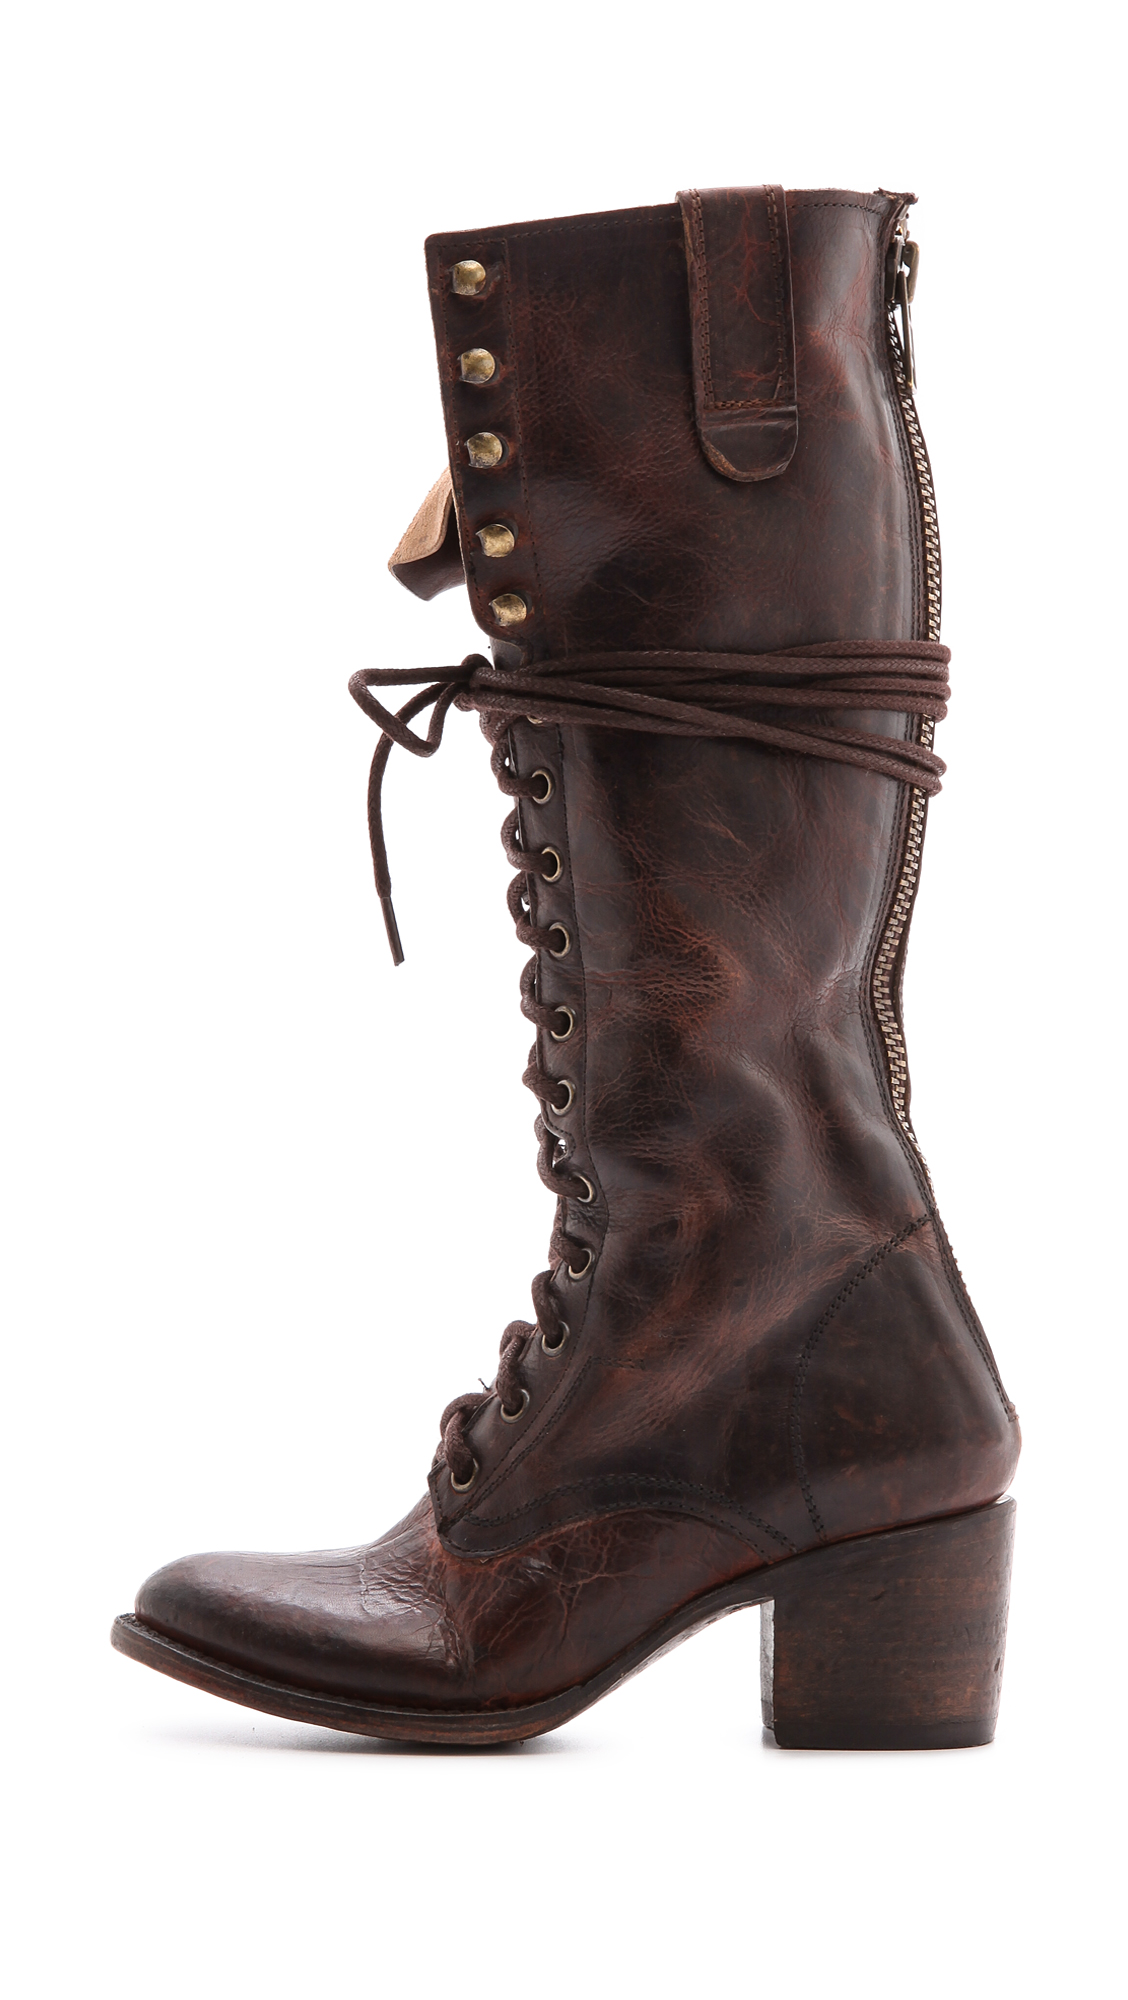 6871a5f1b20598 FREEBIRD by Steven Granny Tall Combat Boots | SHOPBOP